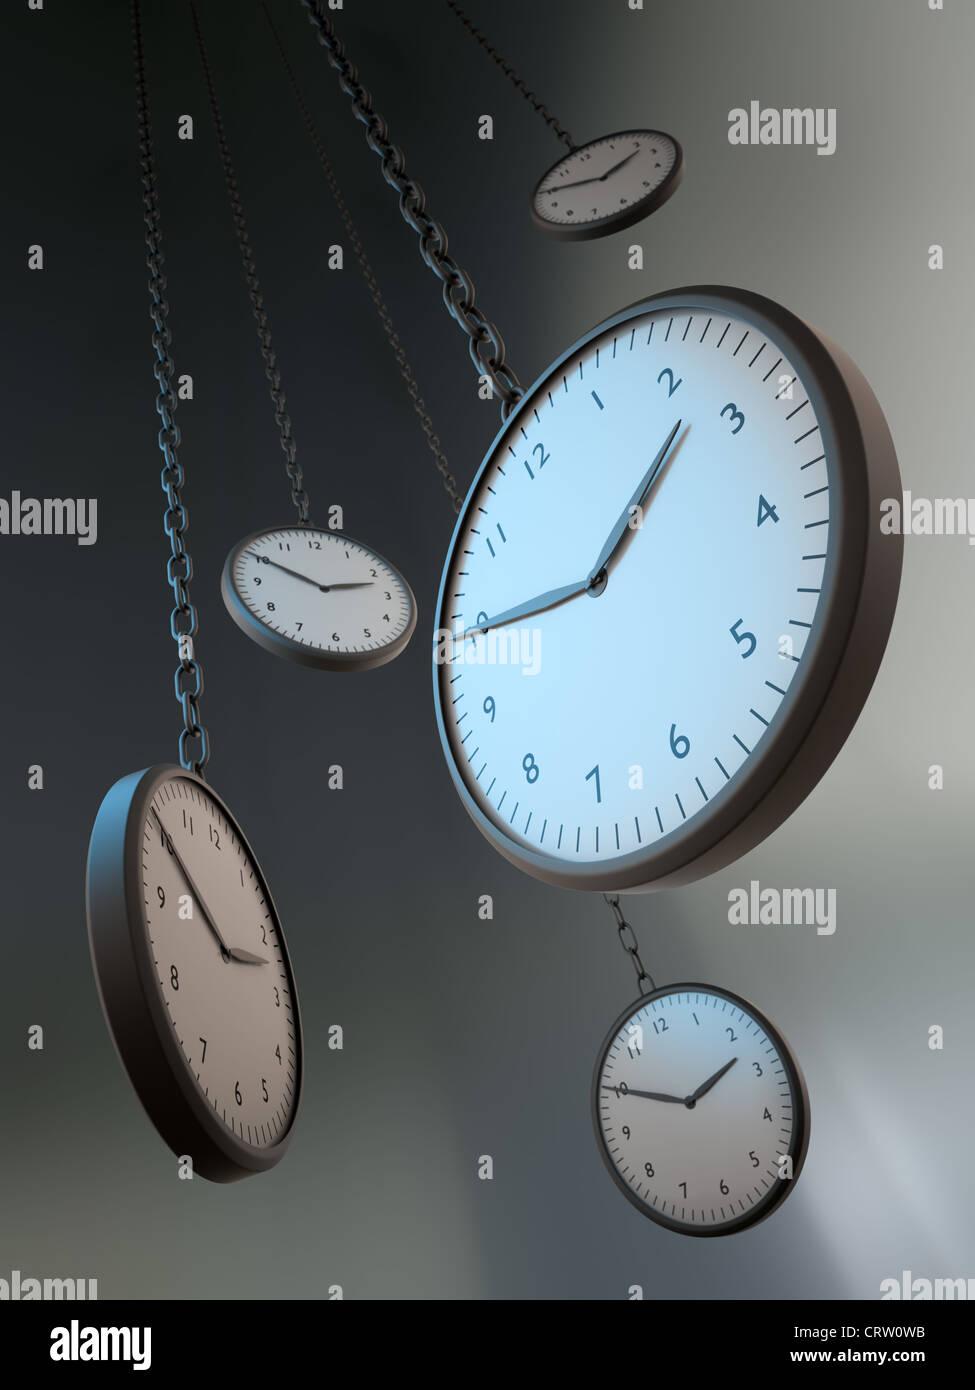 Time metaphor - Stock Image